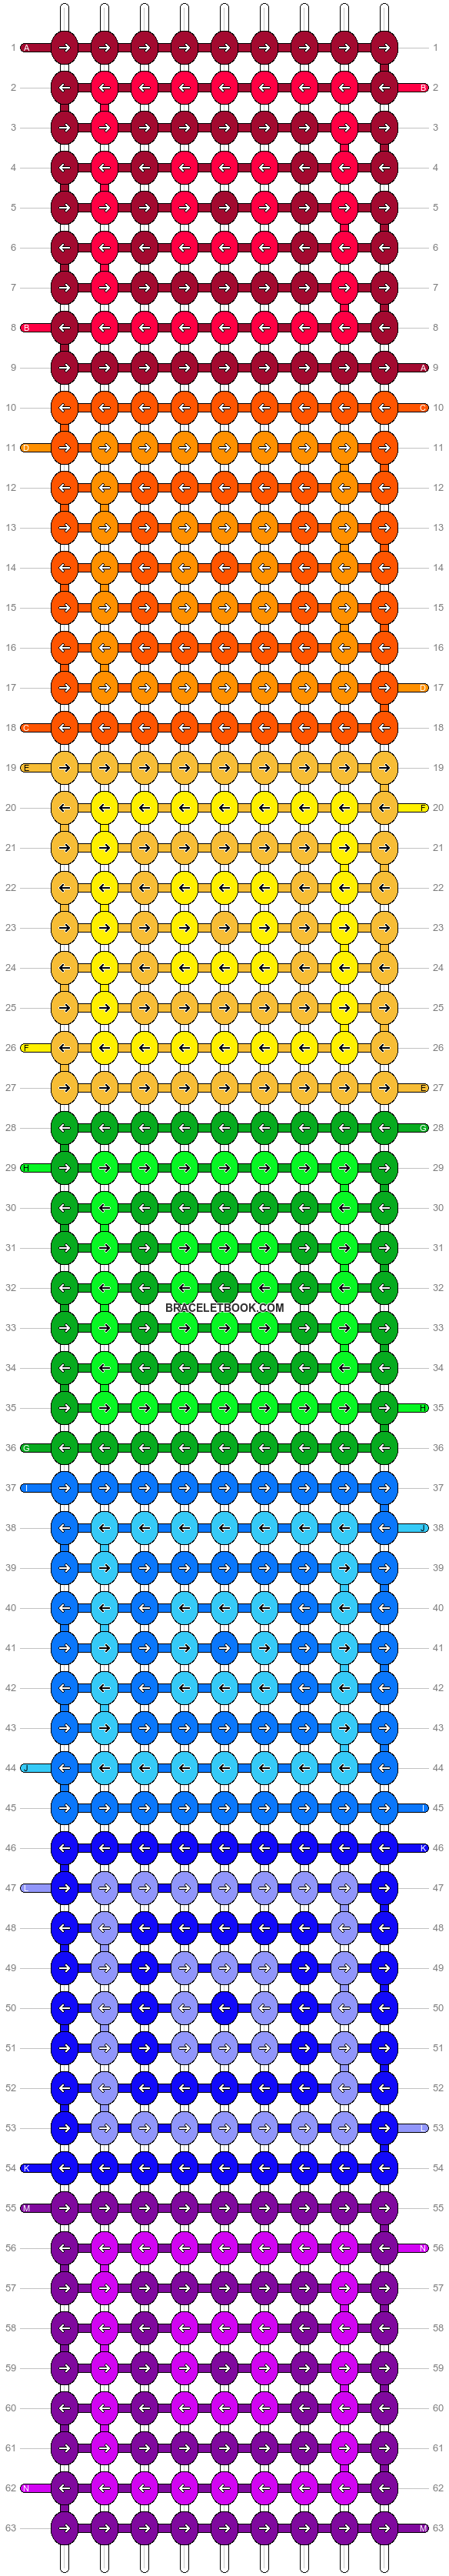 Alpha pattern #15460 pattern